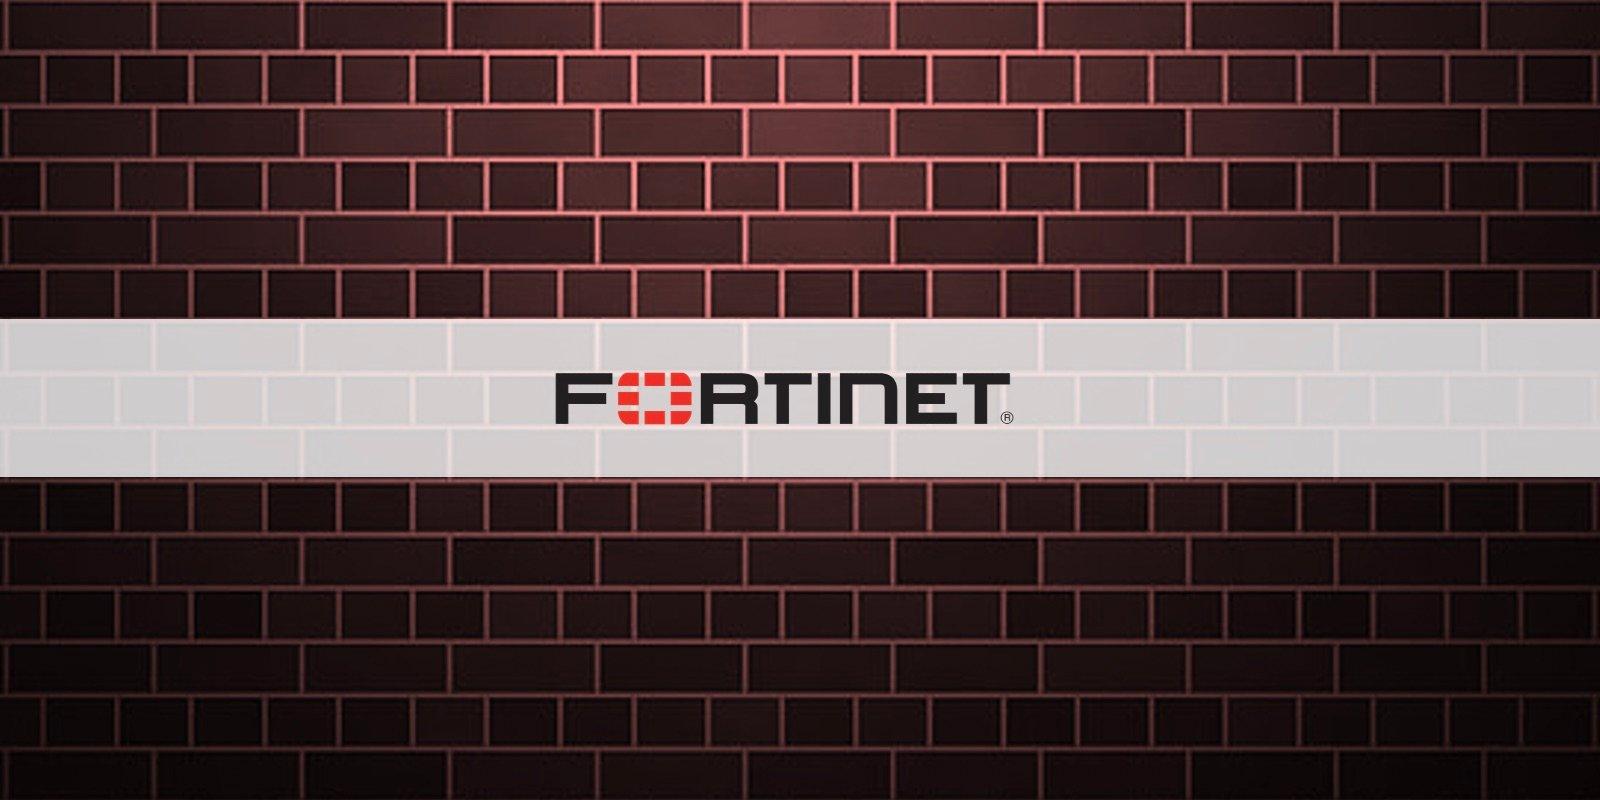 Власти США предупредили об атаках APT-групп через уязвимости в Fortinet FortiOS VPN